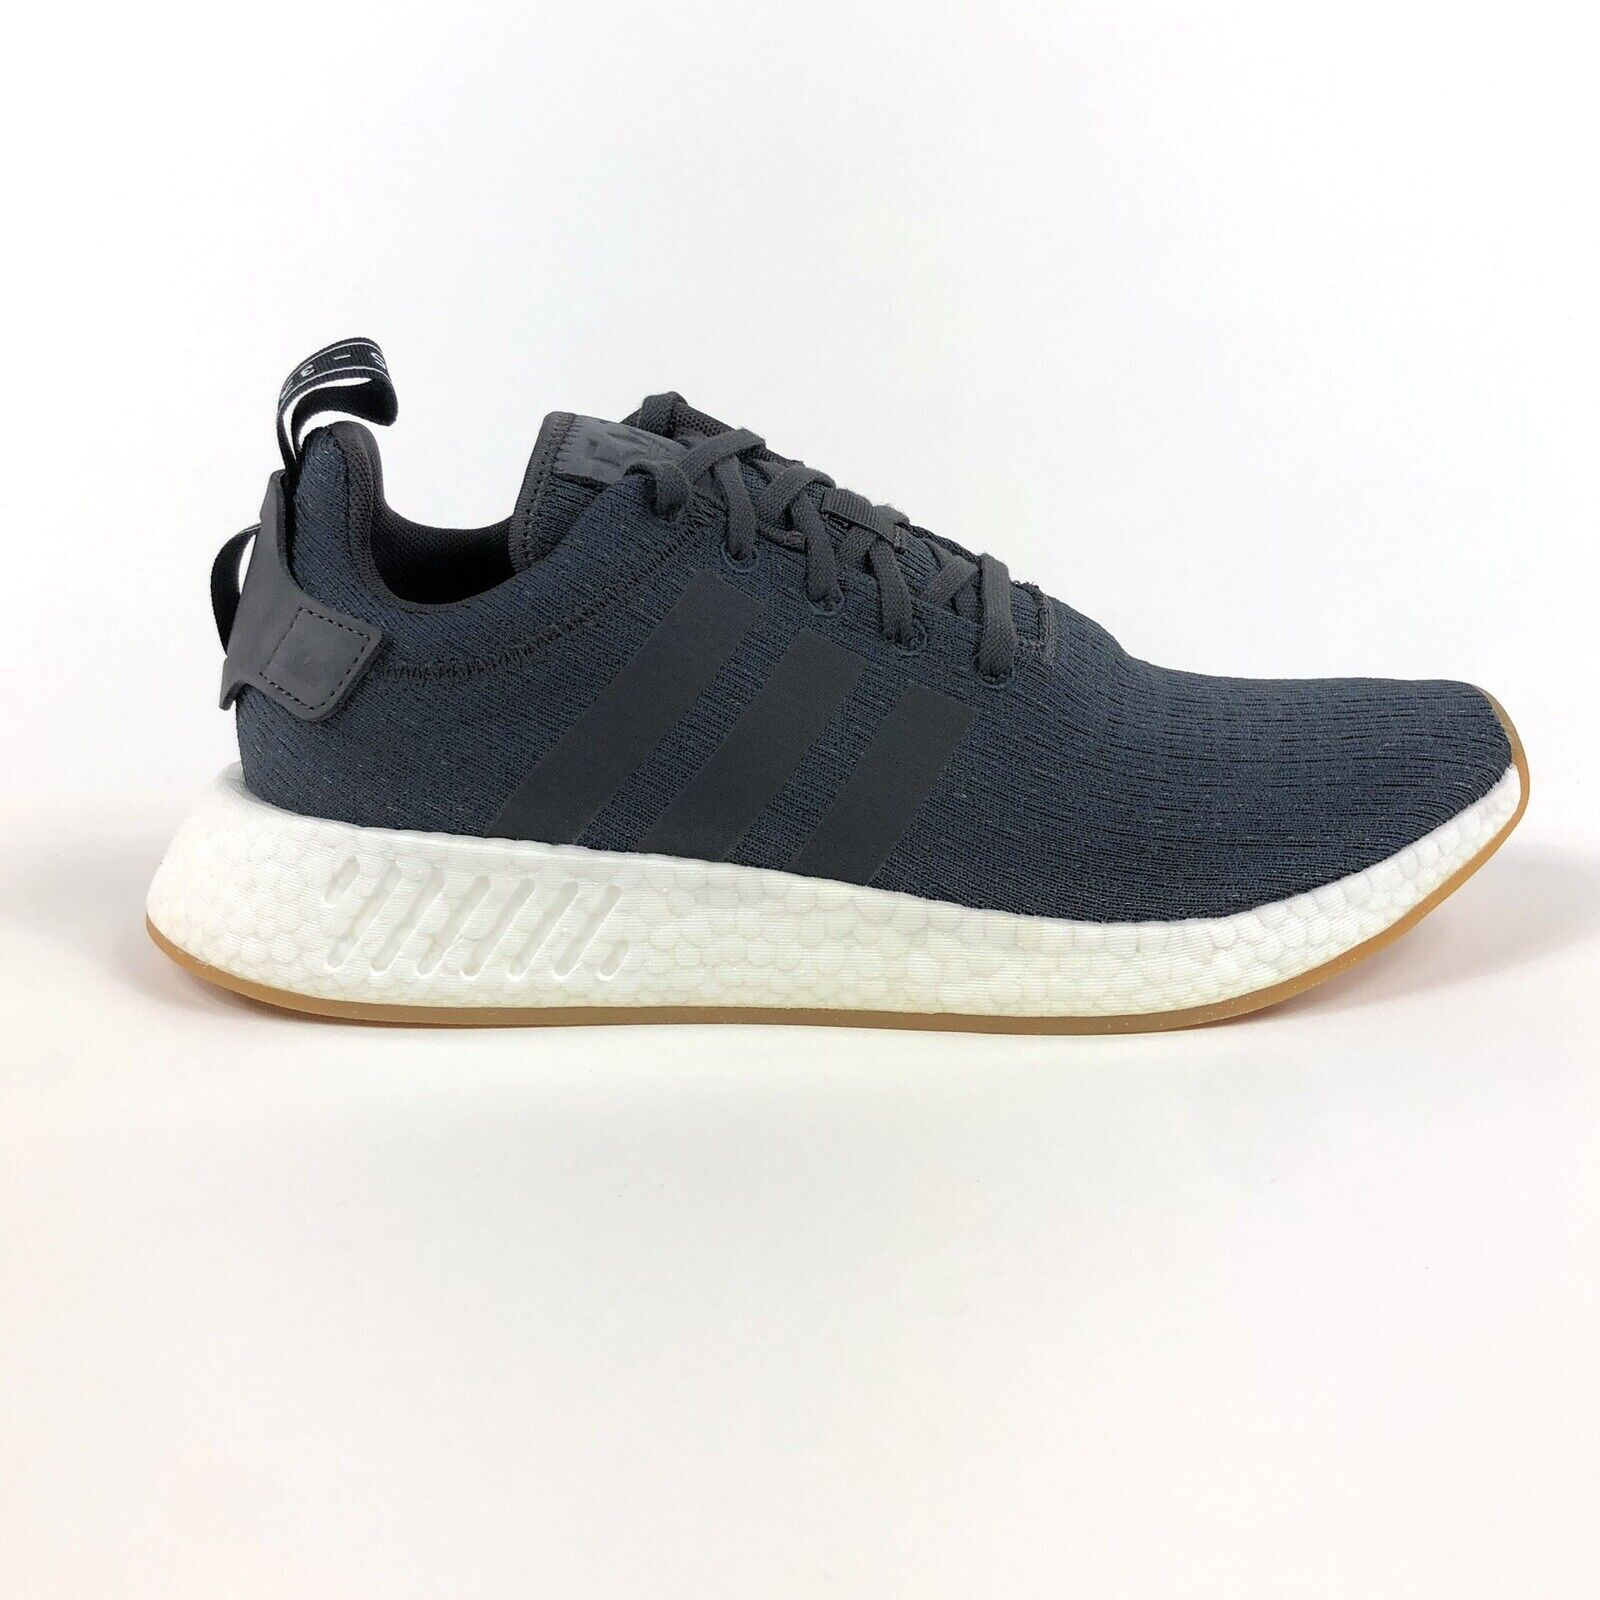 Size 8.5 - adidas NMD R2 Grey Five 2017